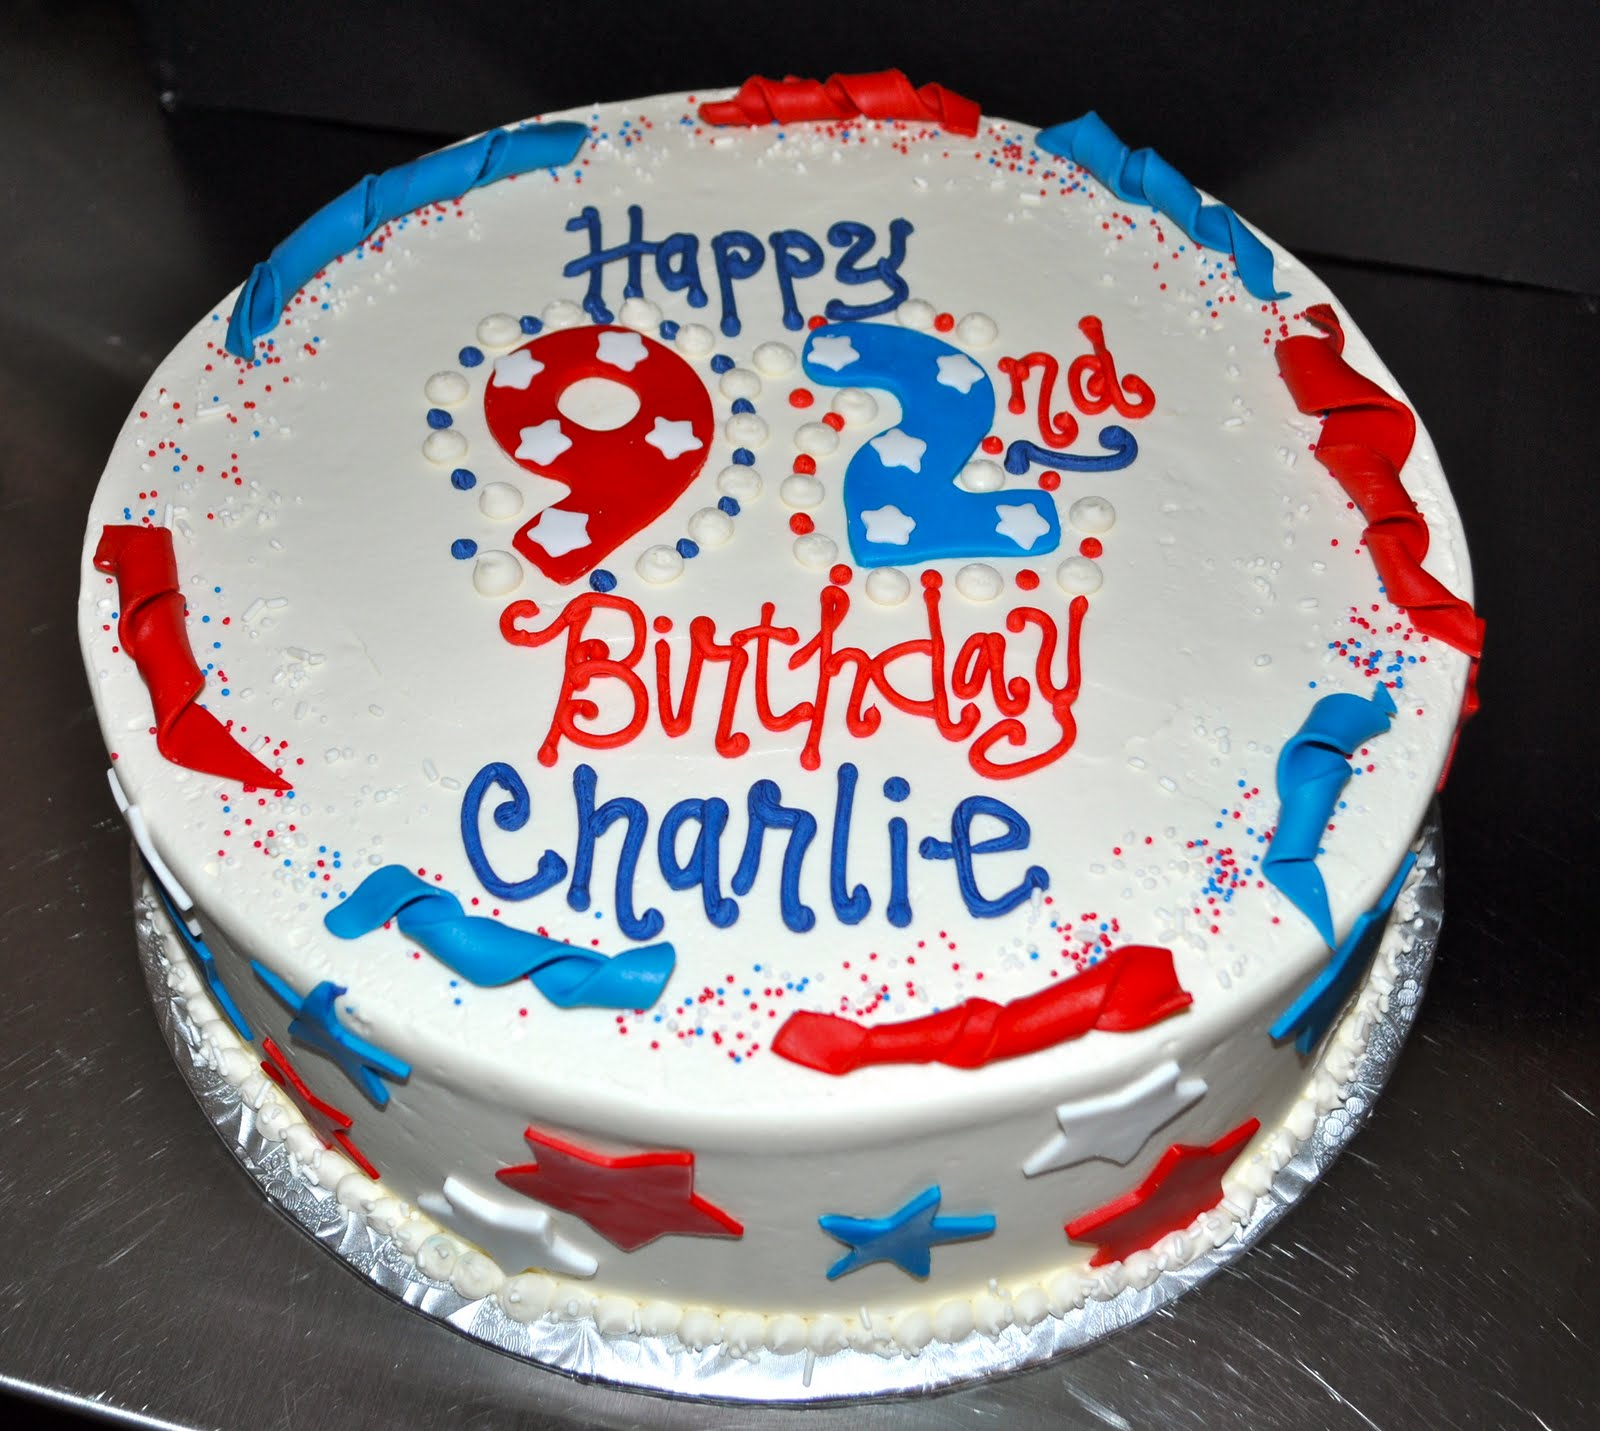 Cake Decoration Day : Leah s Sweet Treats: Memorial Day Birthday Cake